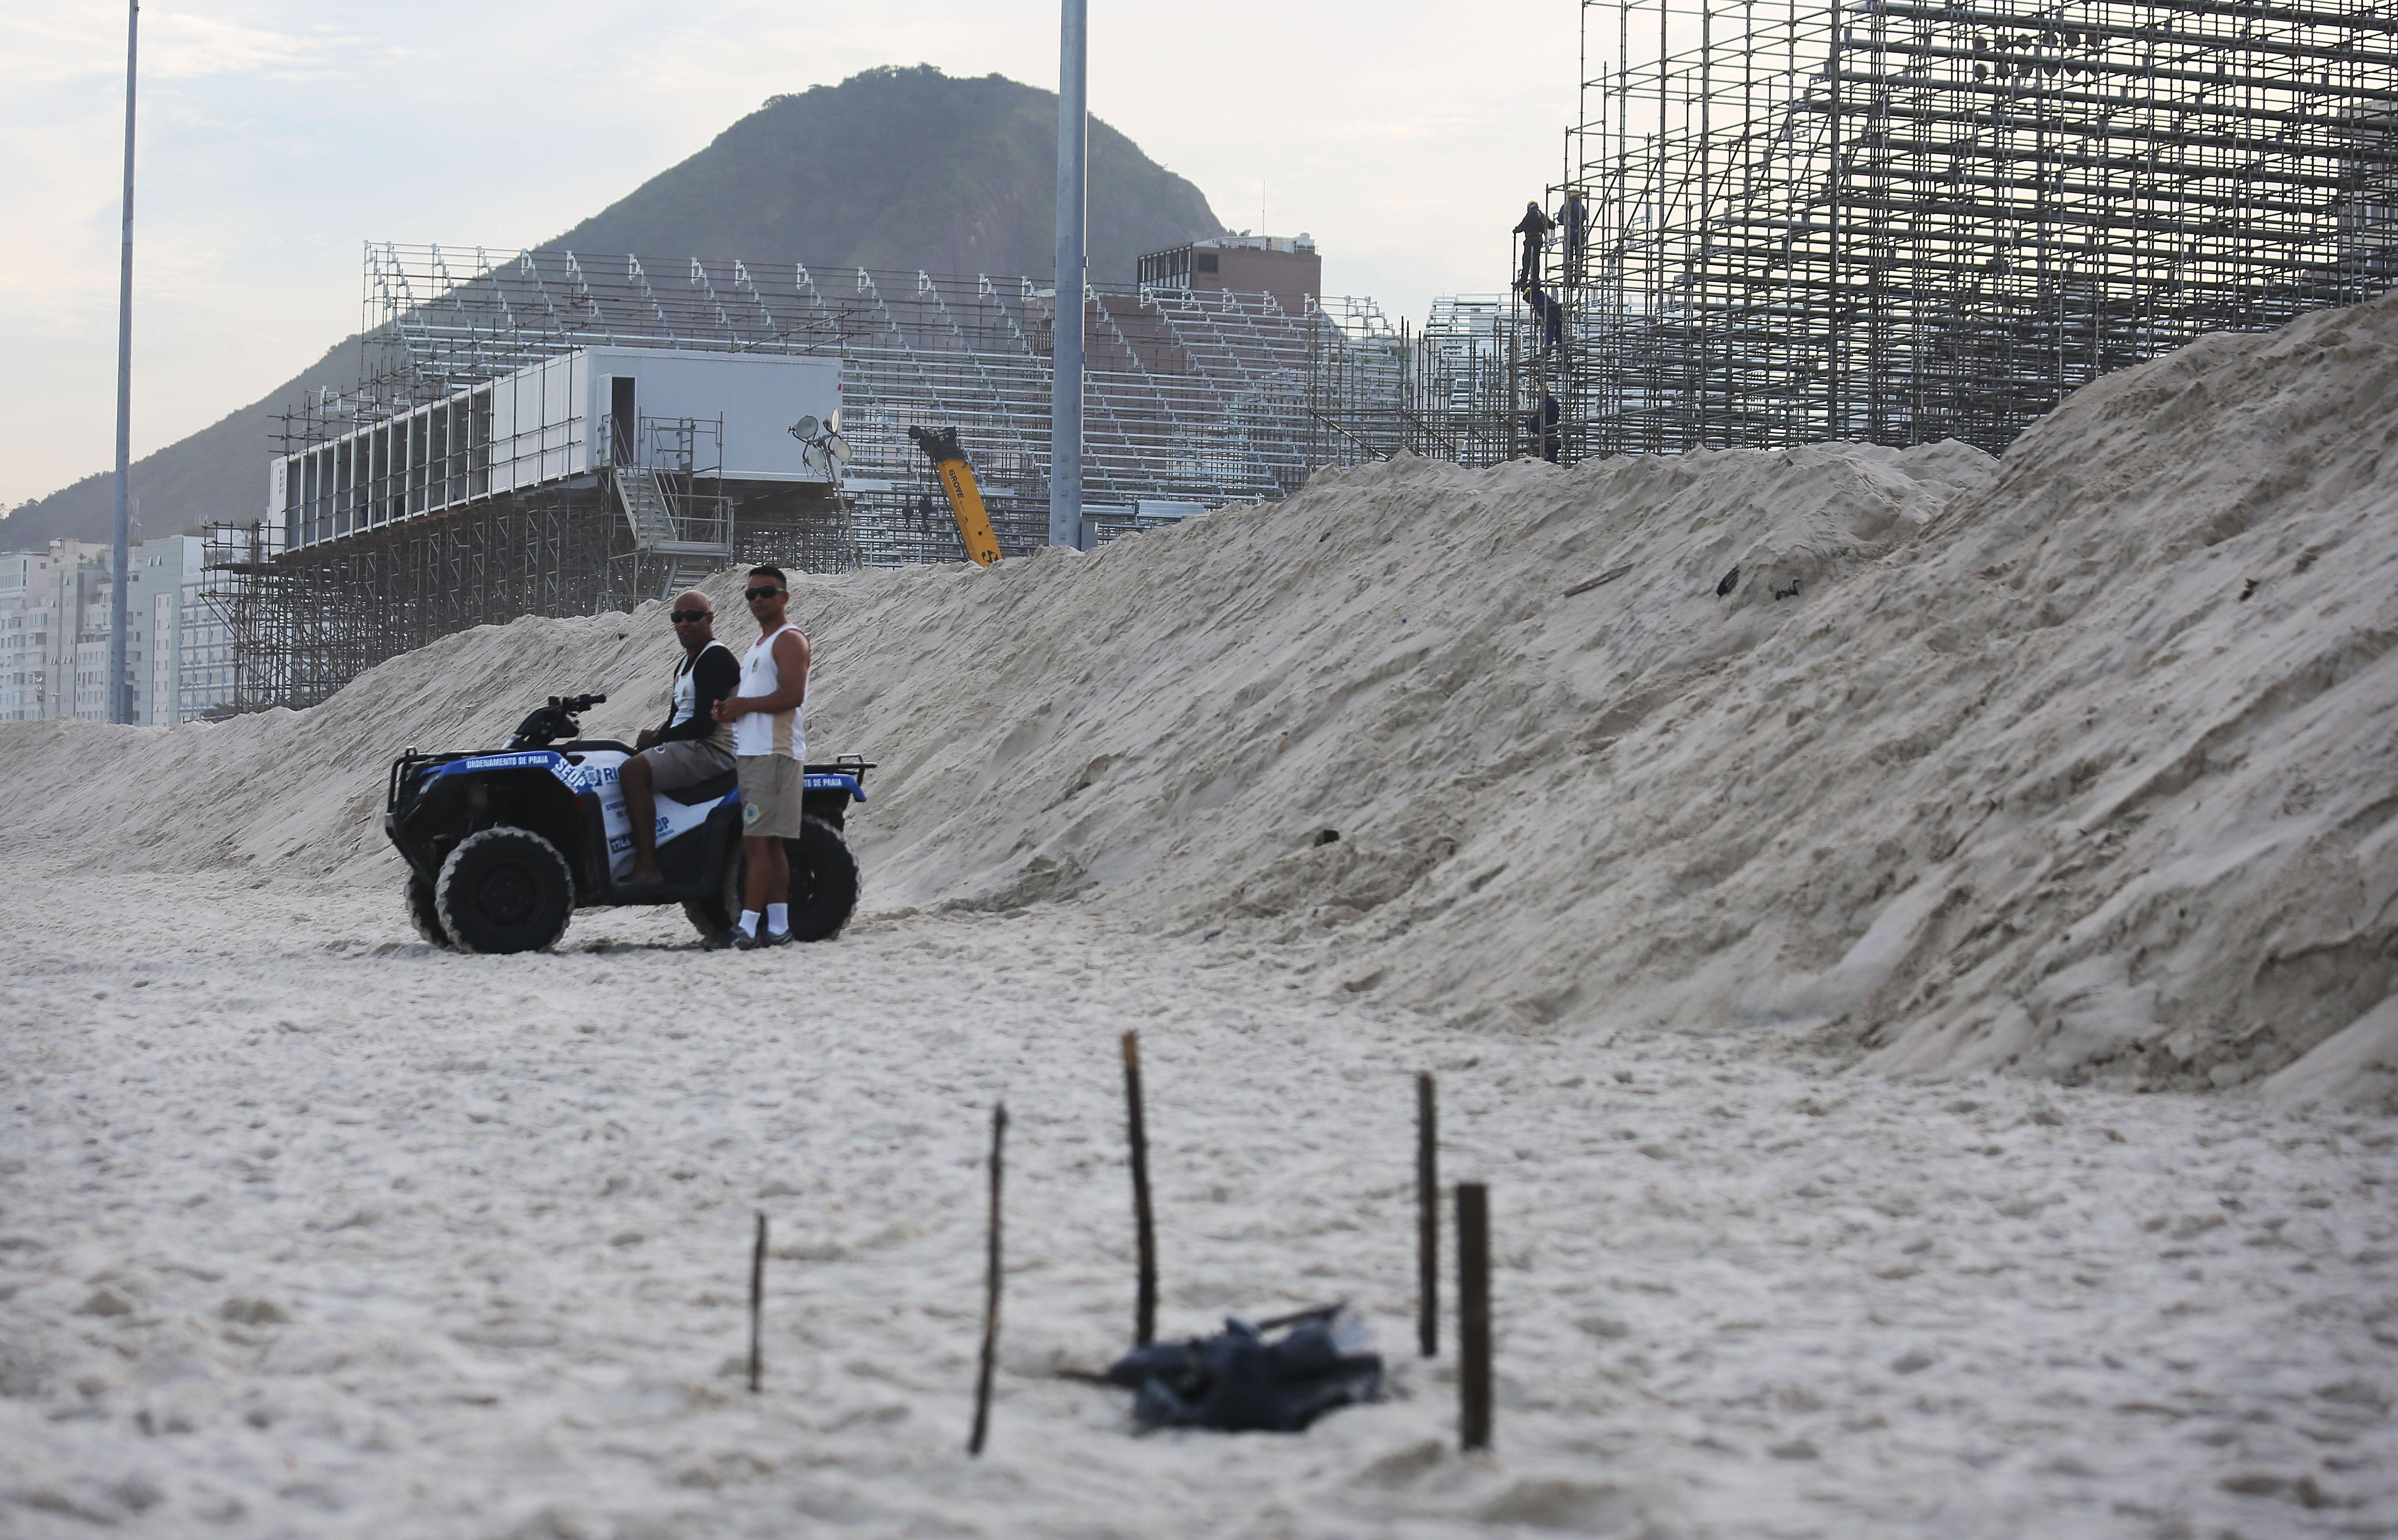 Dead Body Parts Wash Up On Rio De Janeiro Beach Near Olympic Volleyball Venue